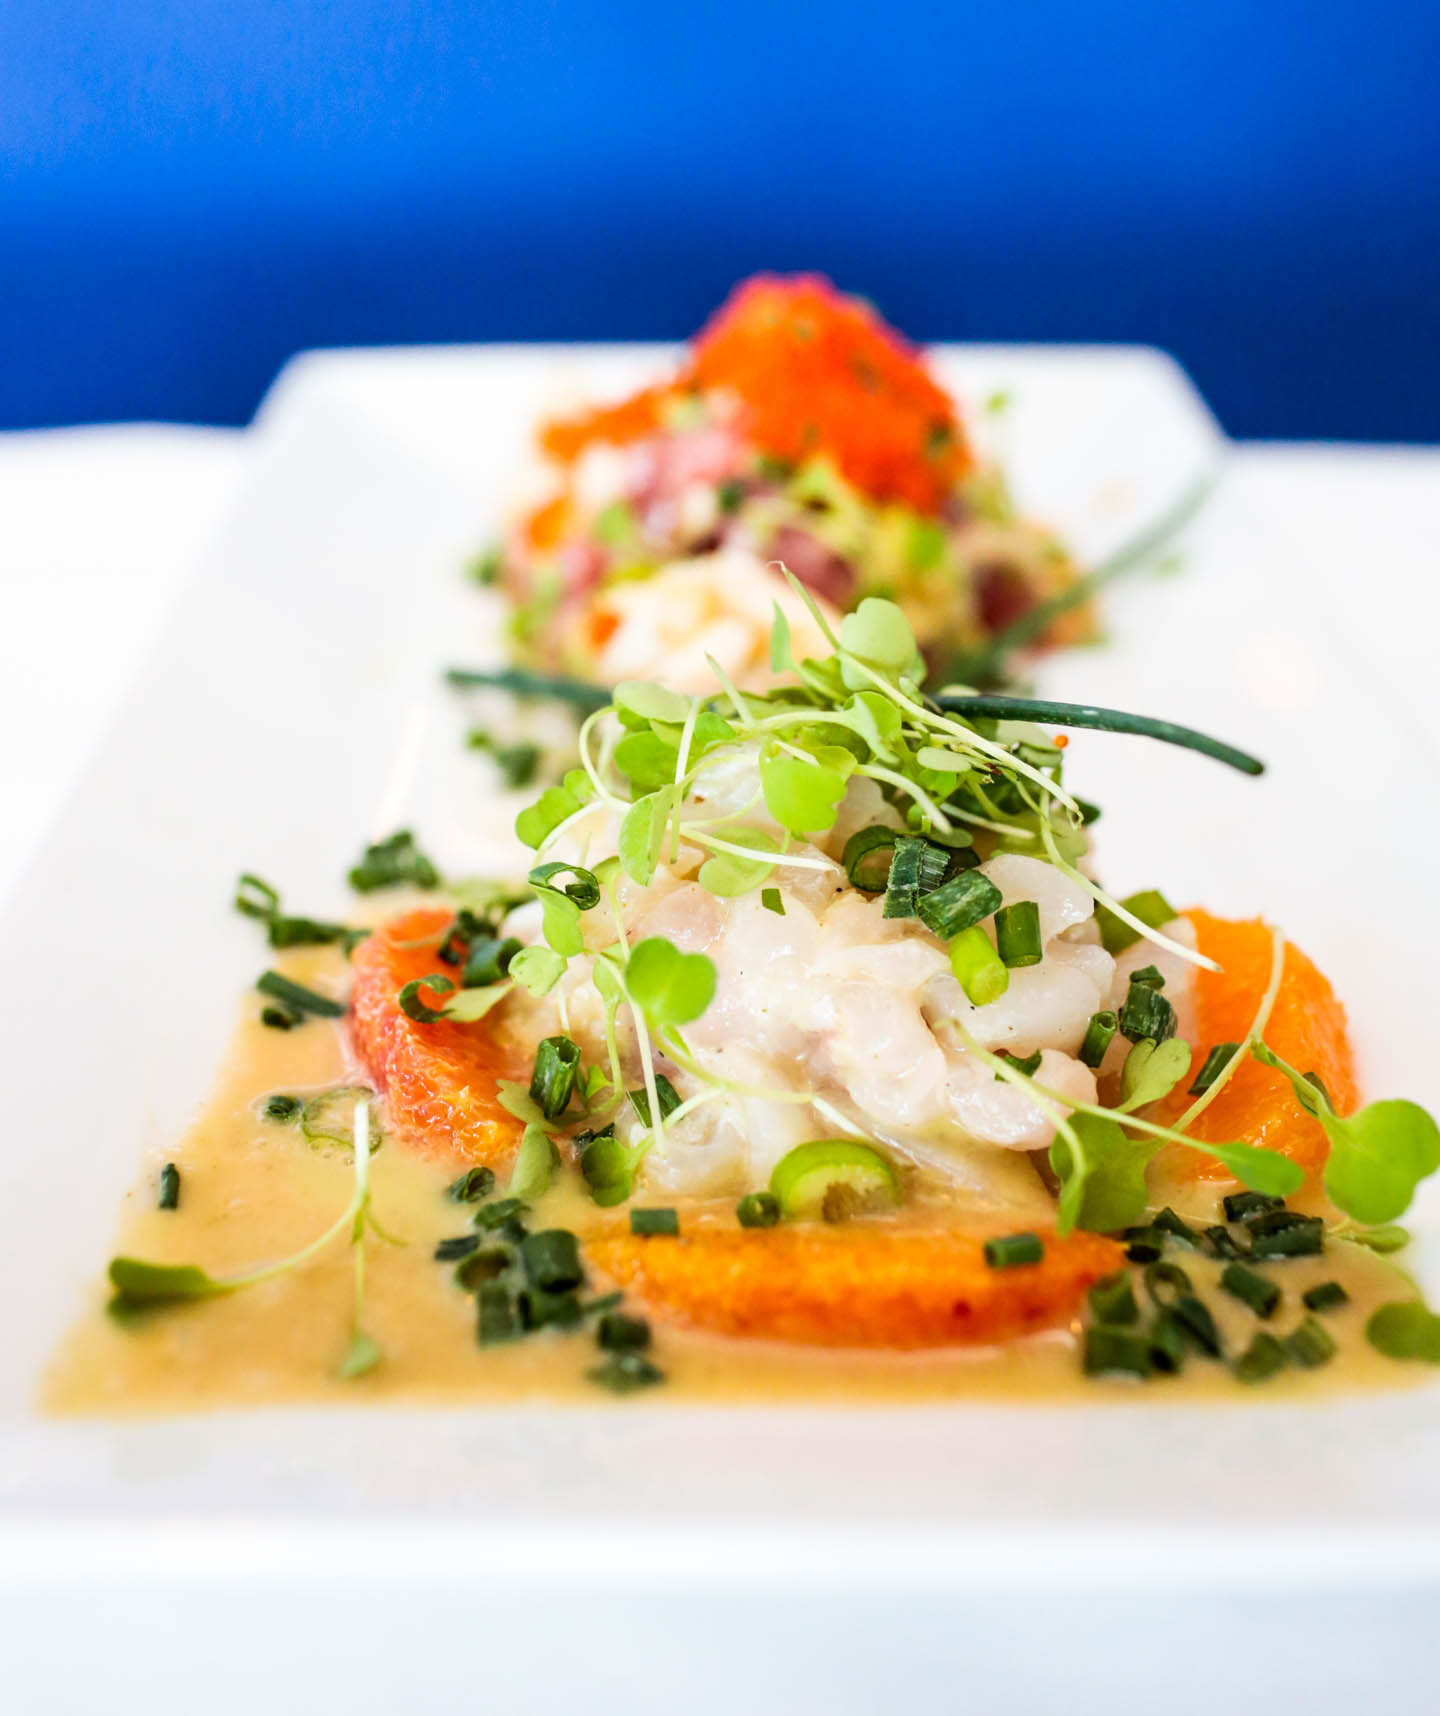 striffler-photography-lifestyle-food-Hamptons-8.jpg